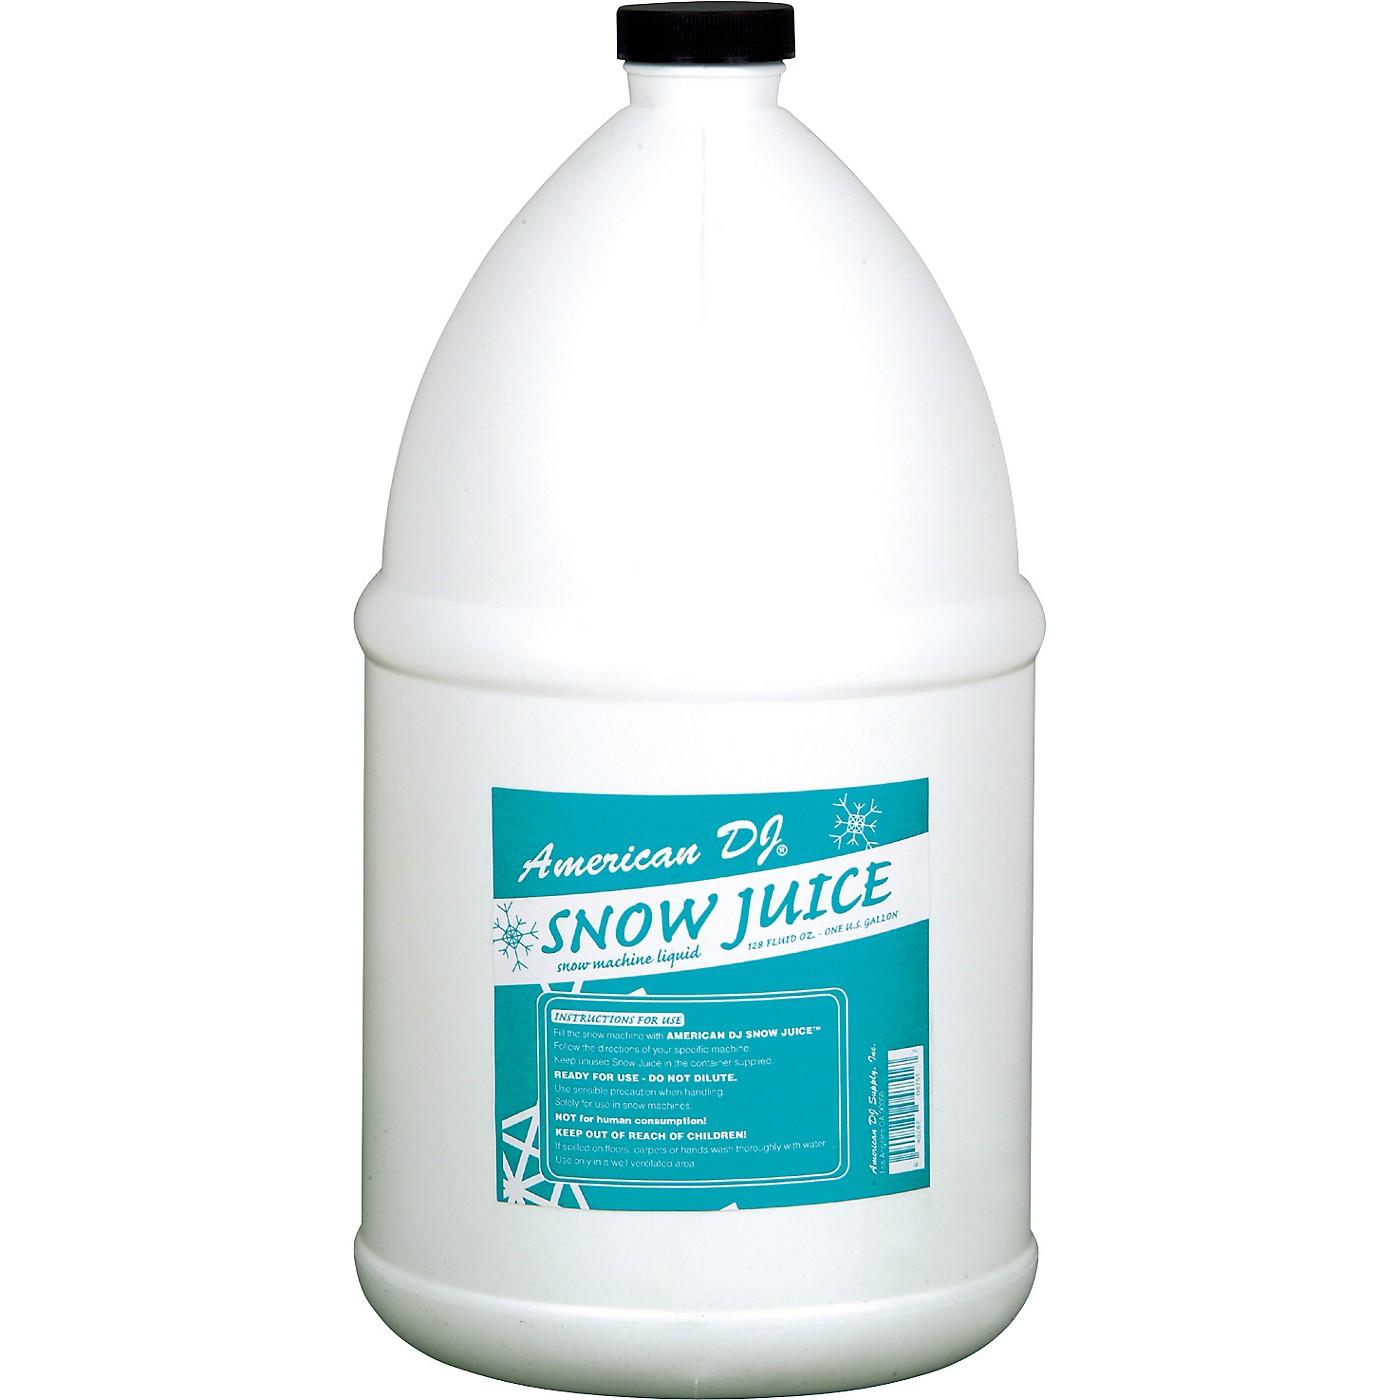 American DJ Snow Juice - Gallon thumbnail